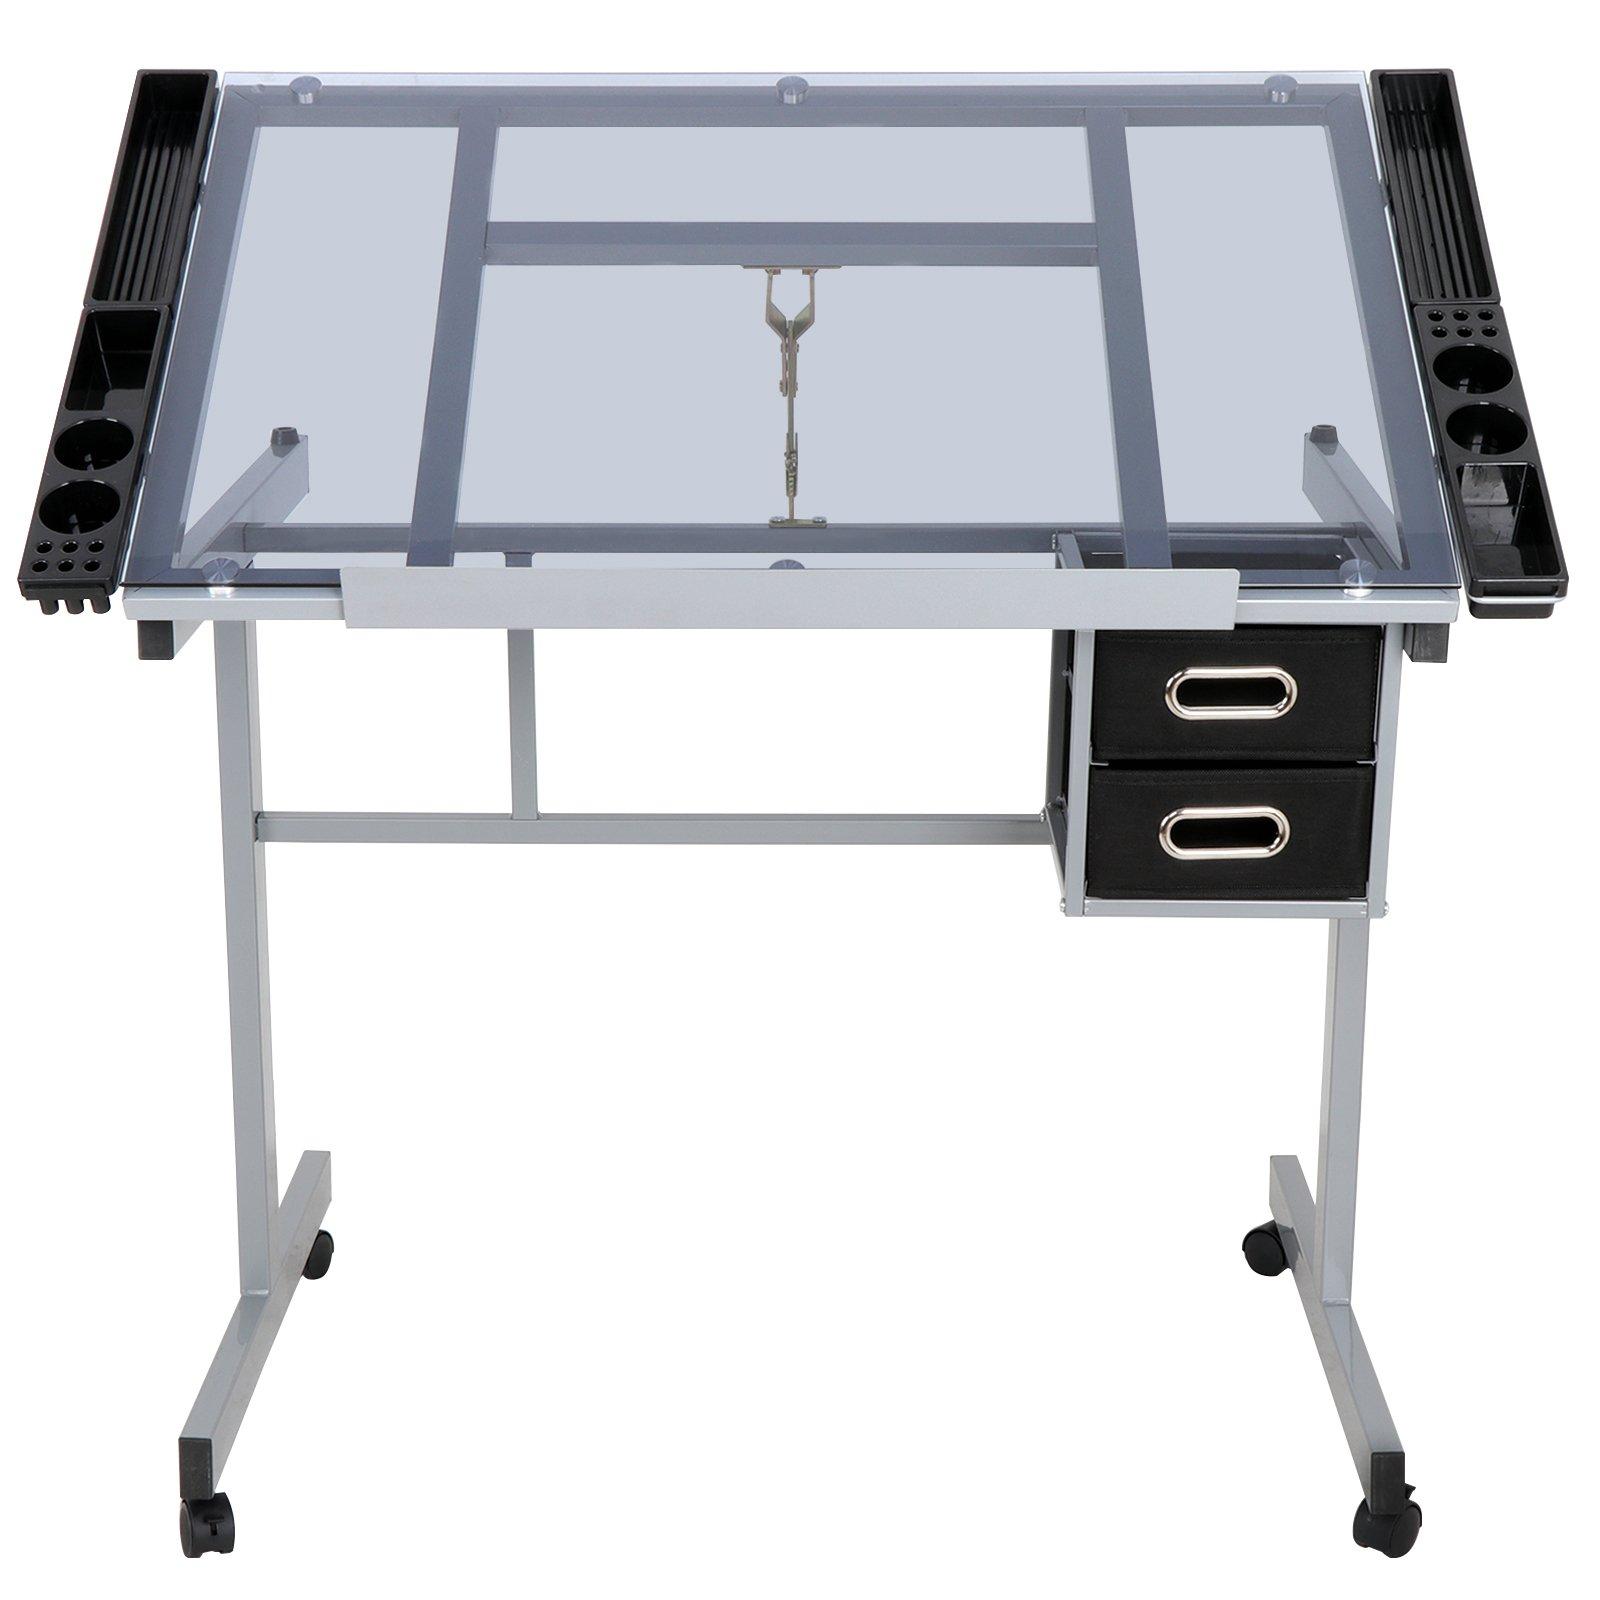 JupiterForce Adjustable Drafting Table Drawing Desk Height Art Craft Work Station Folding Glass Tabletop Storage Drawer for Reading Writing by JupiterForce